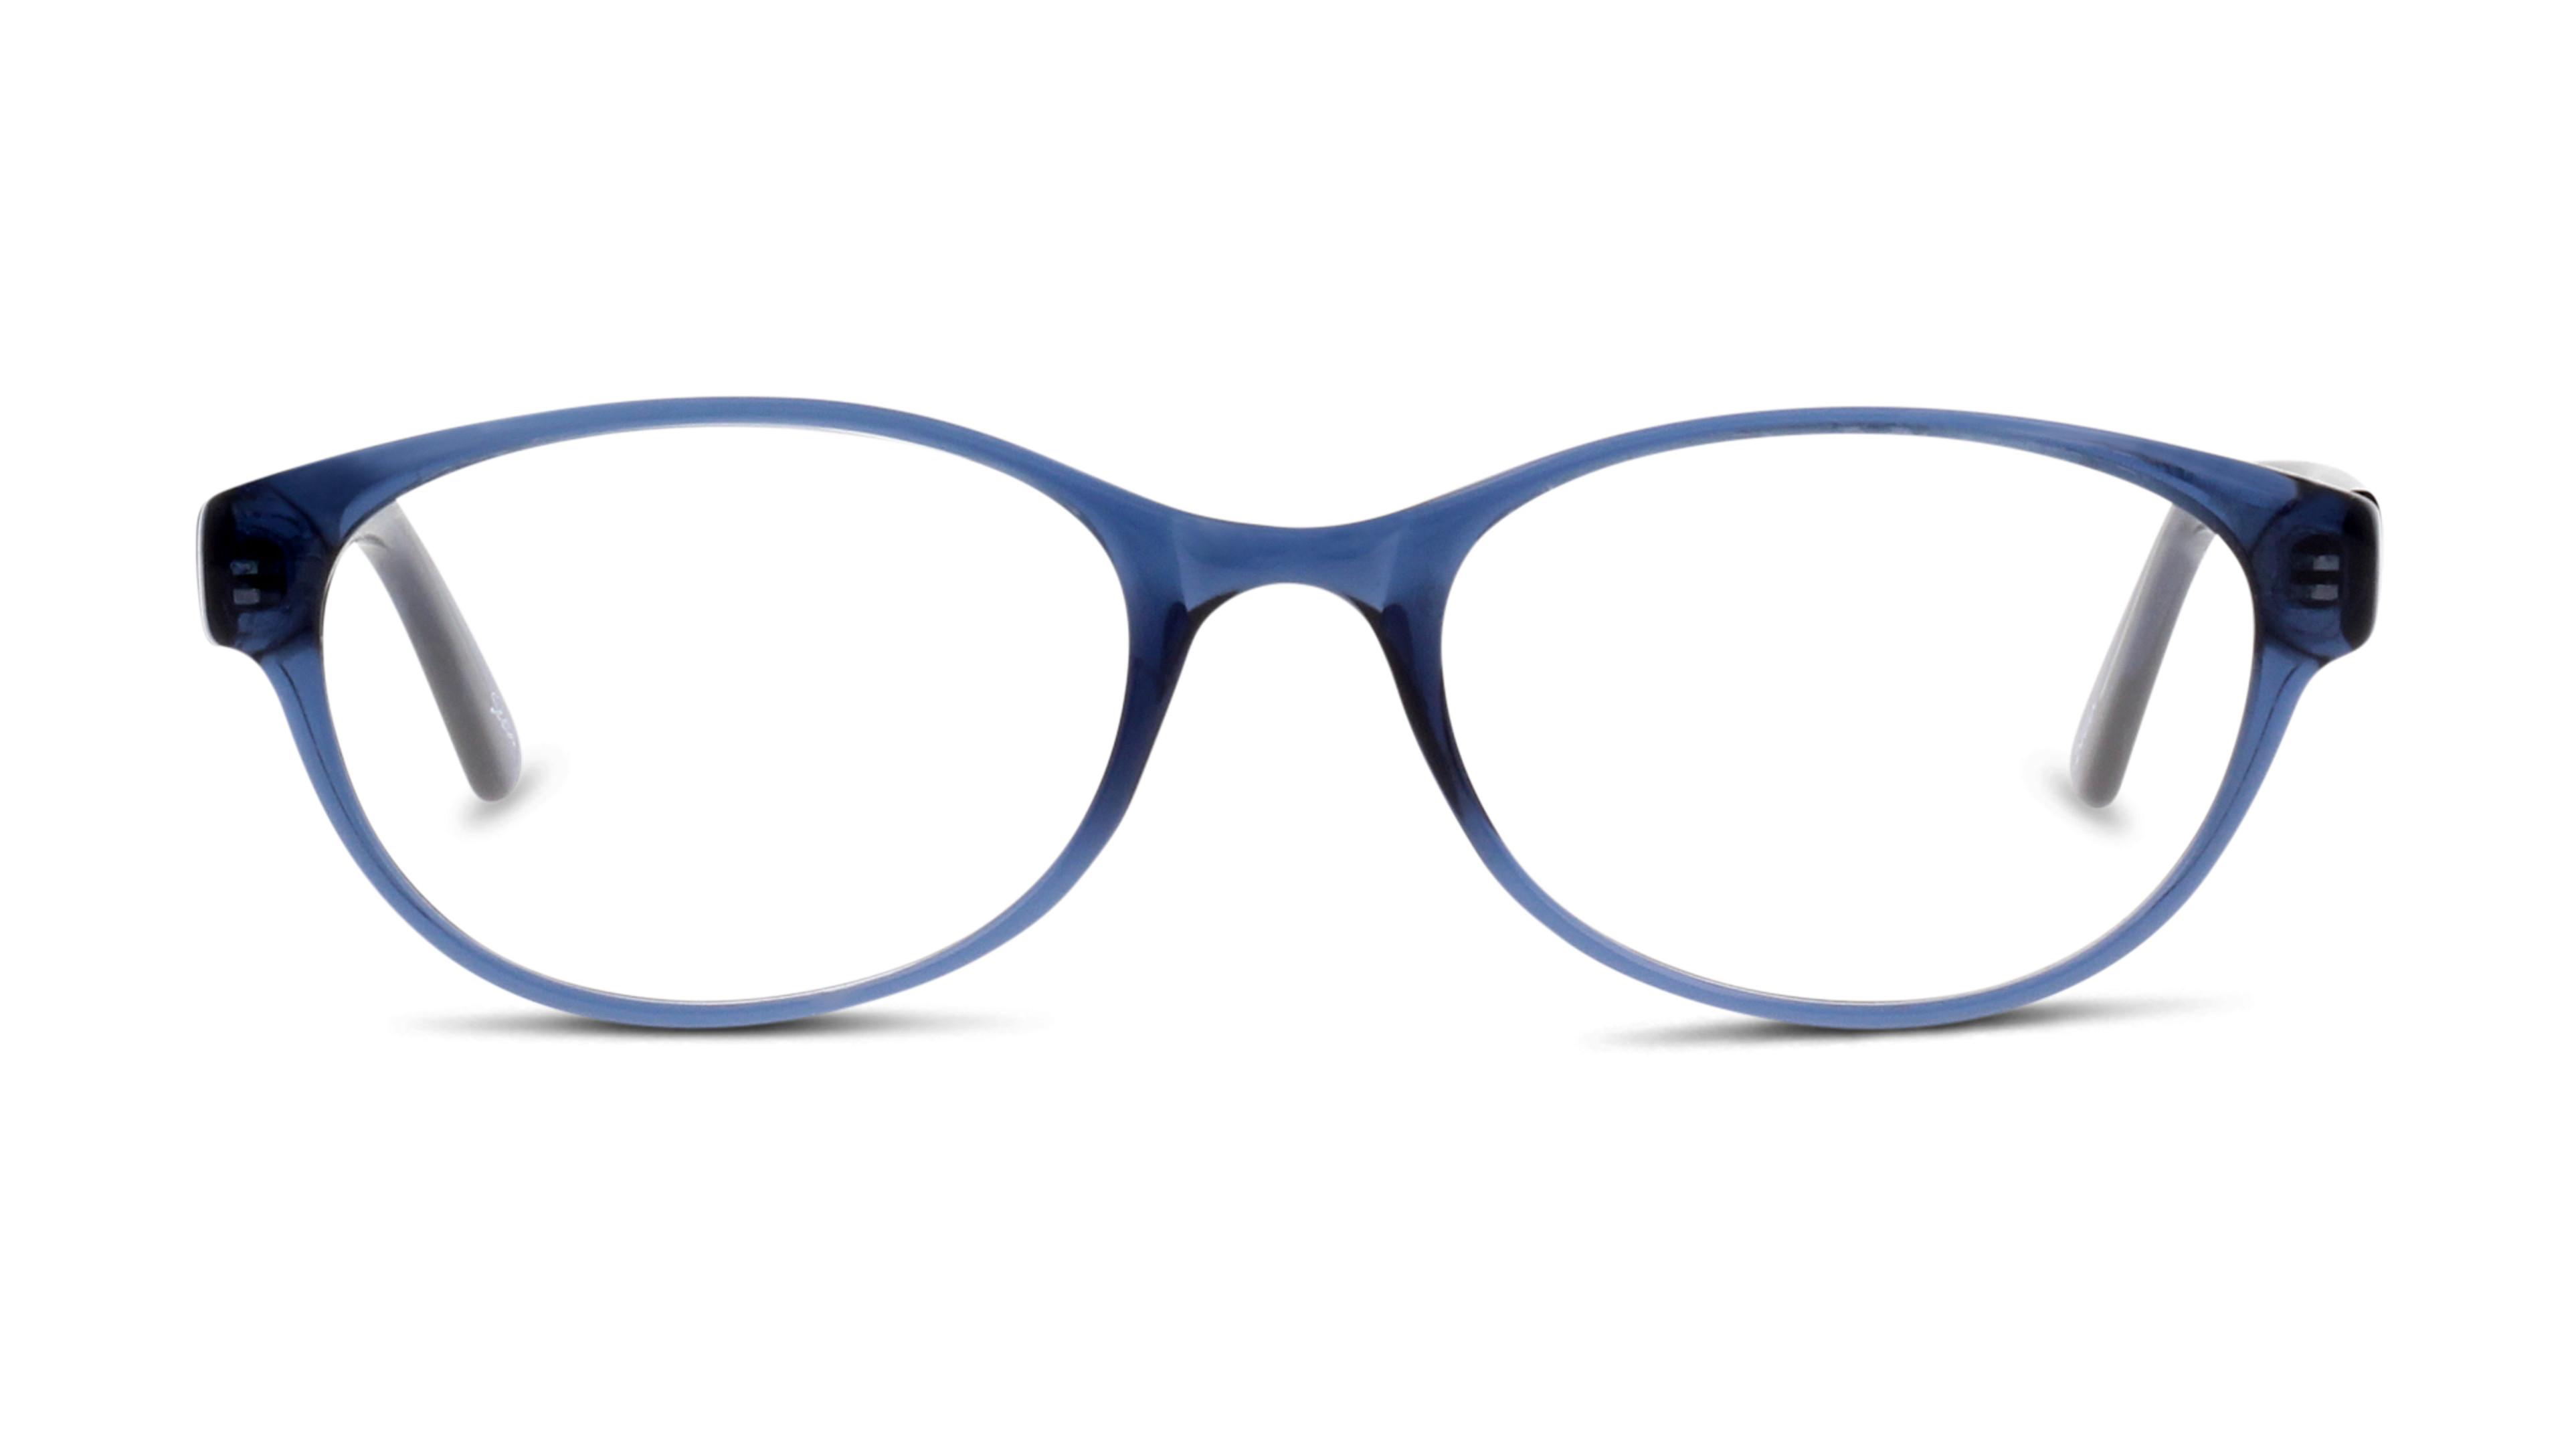 8719154595820-front-01-seen-sncf27-eyewear-navy-blue-navy-blue